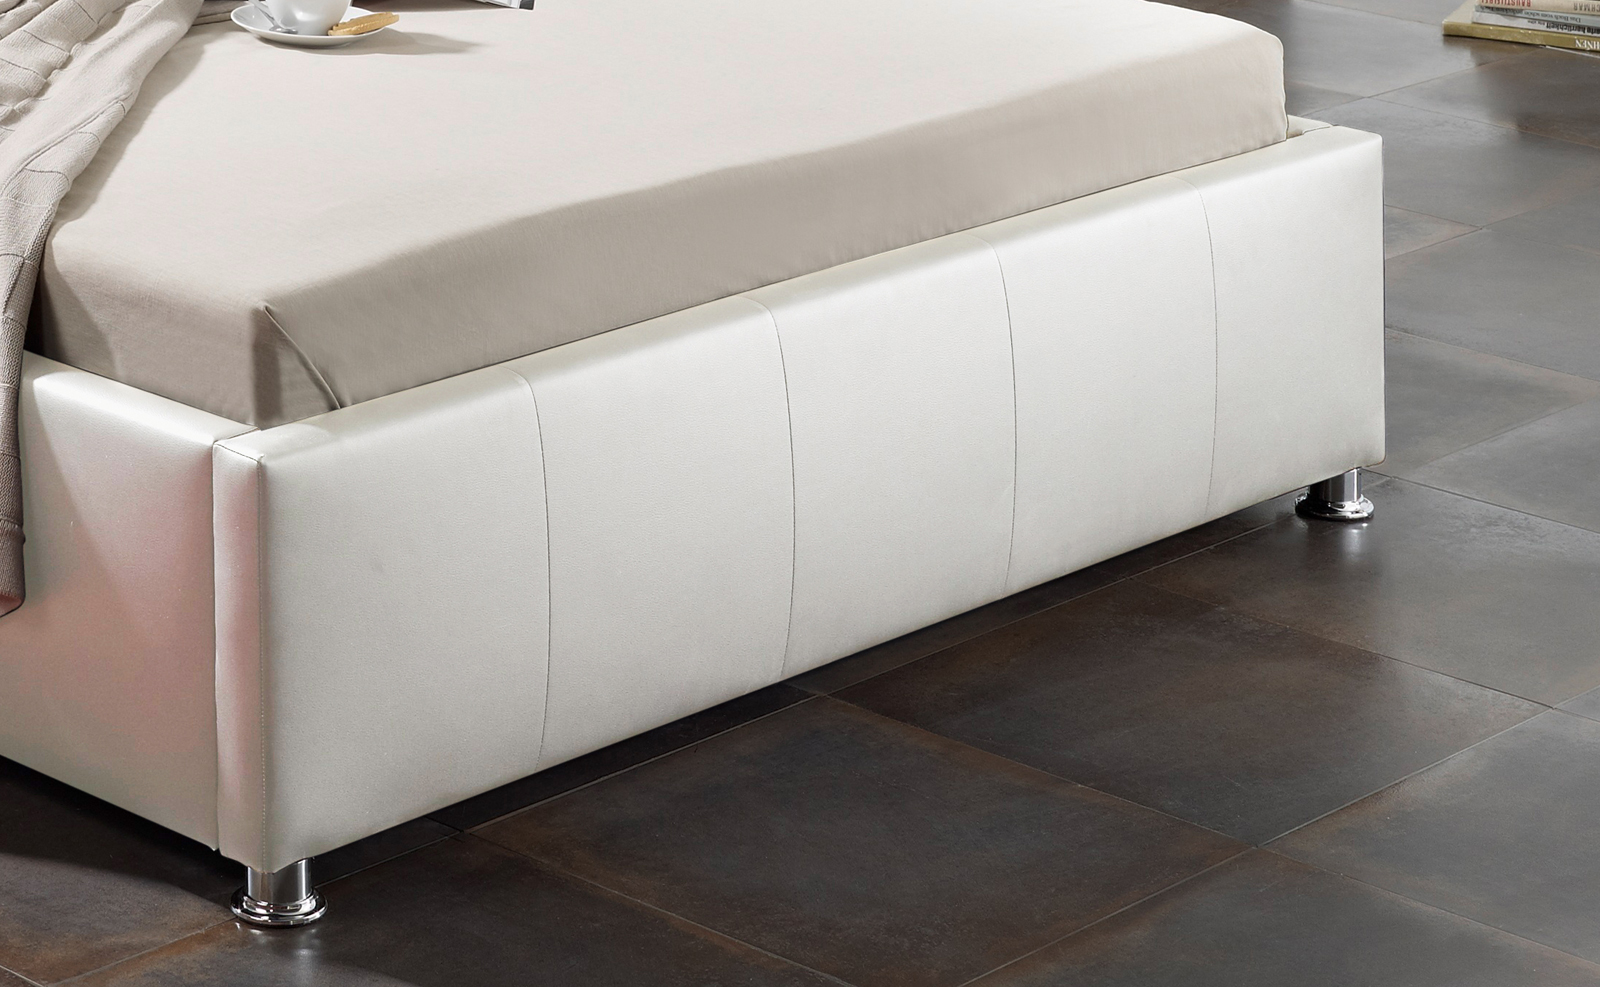 sam design bett 180 x 200 cm wei kira bettkasten. Black Bedroom Furniture Sets. Home Design Ideas